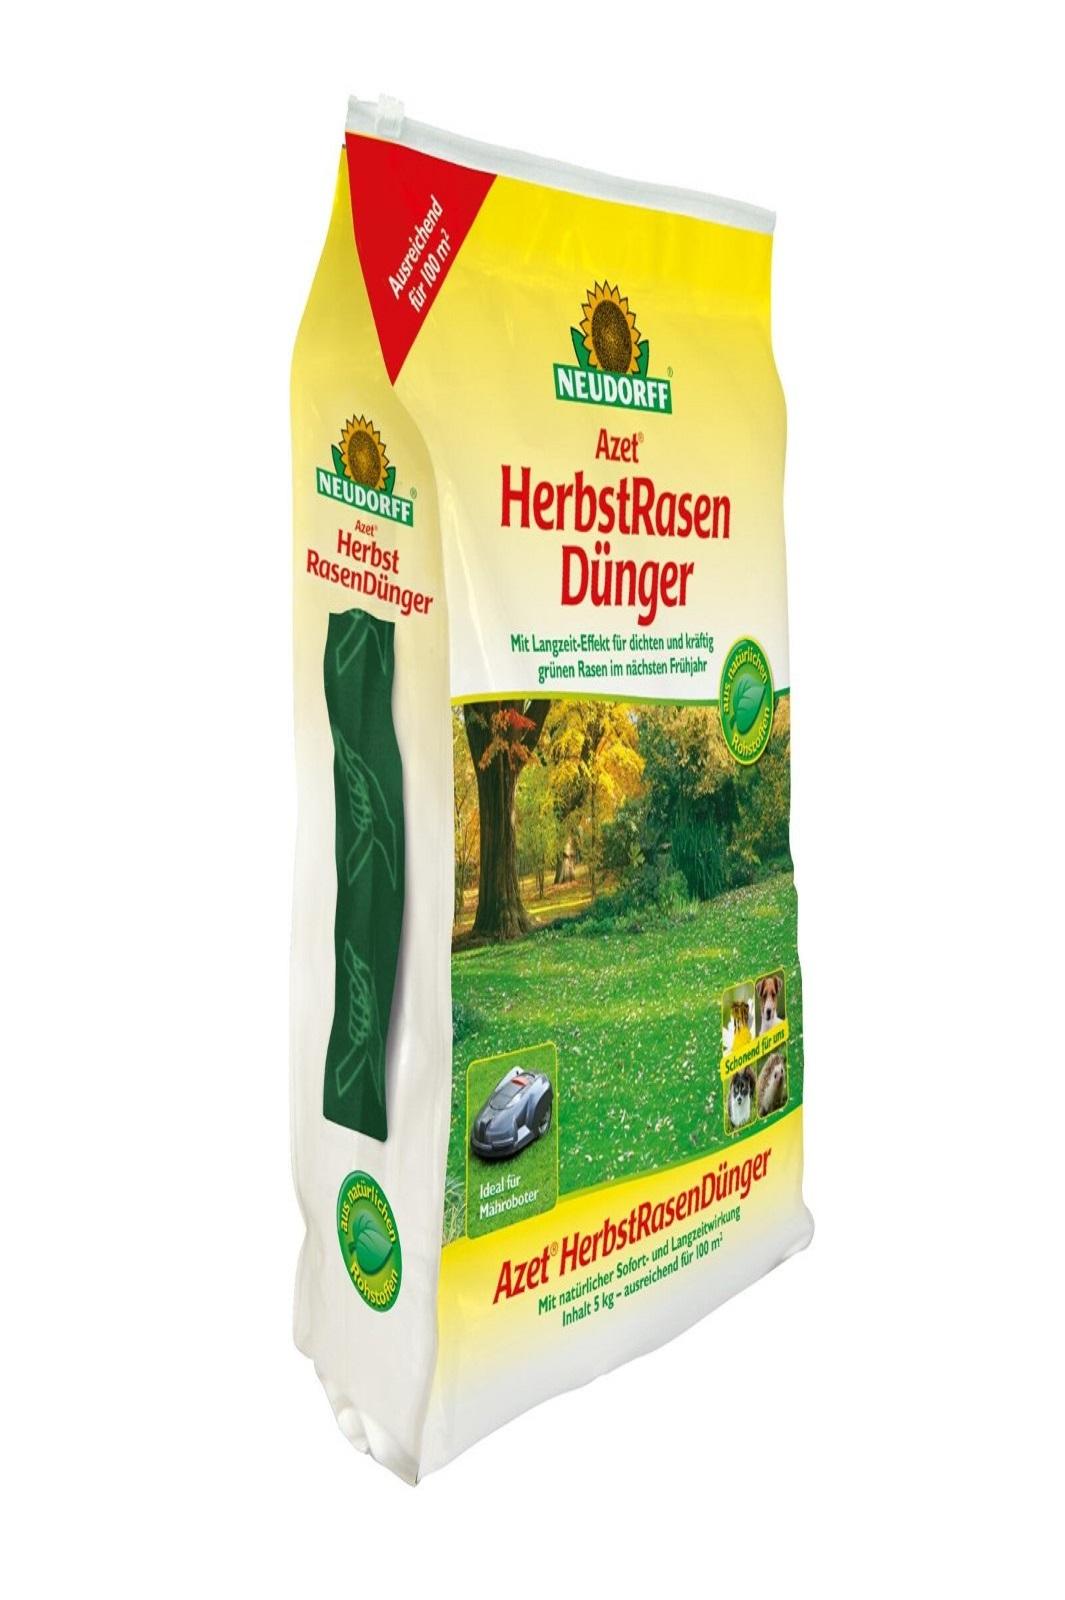 Neudorff  Azet Herbstrasendünger 5 kg Langzeitdünger